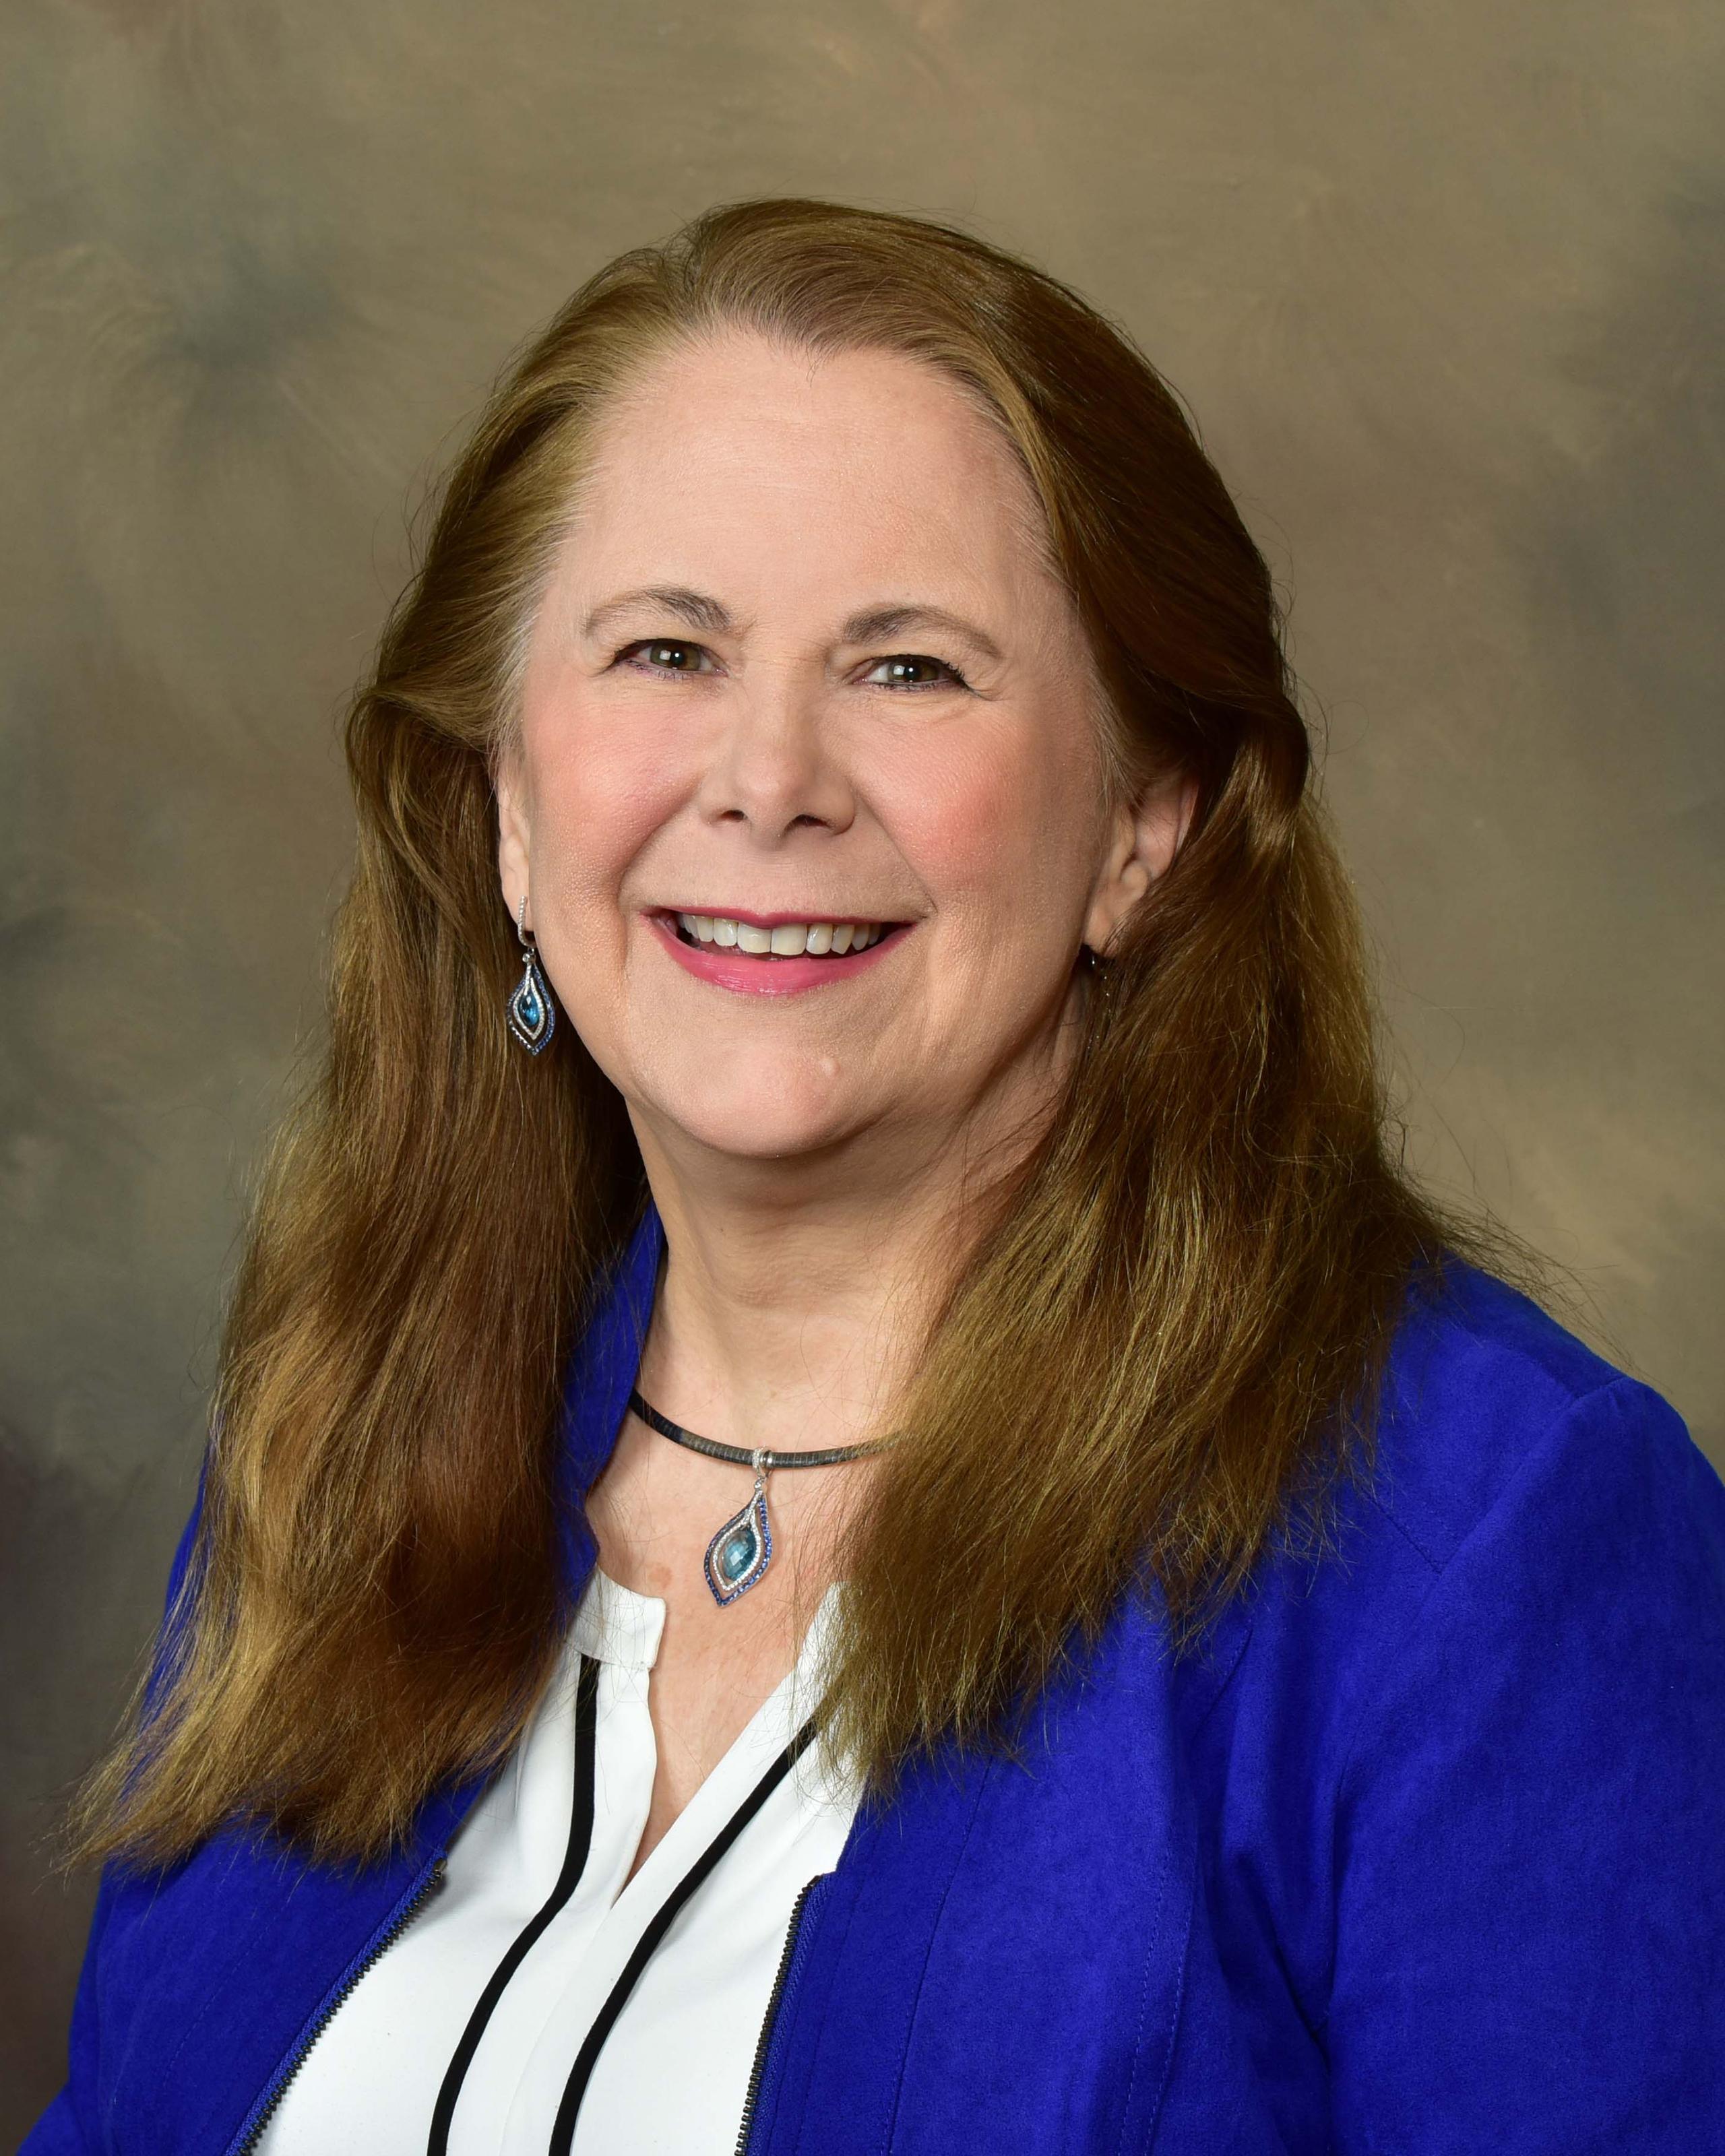 Linda Sommercorn, DDS, MS